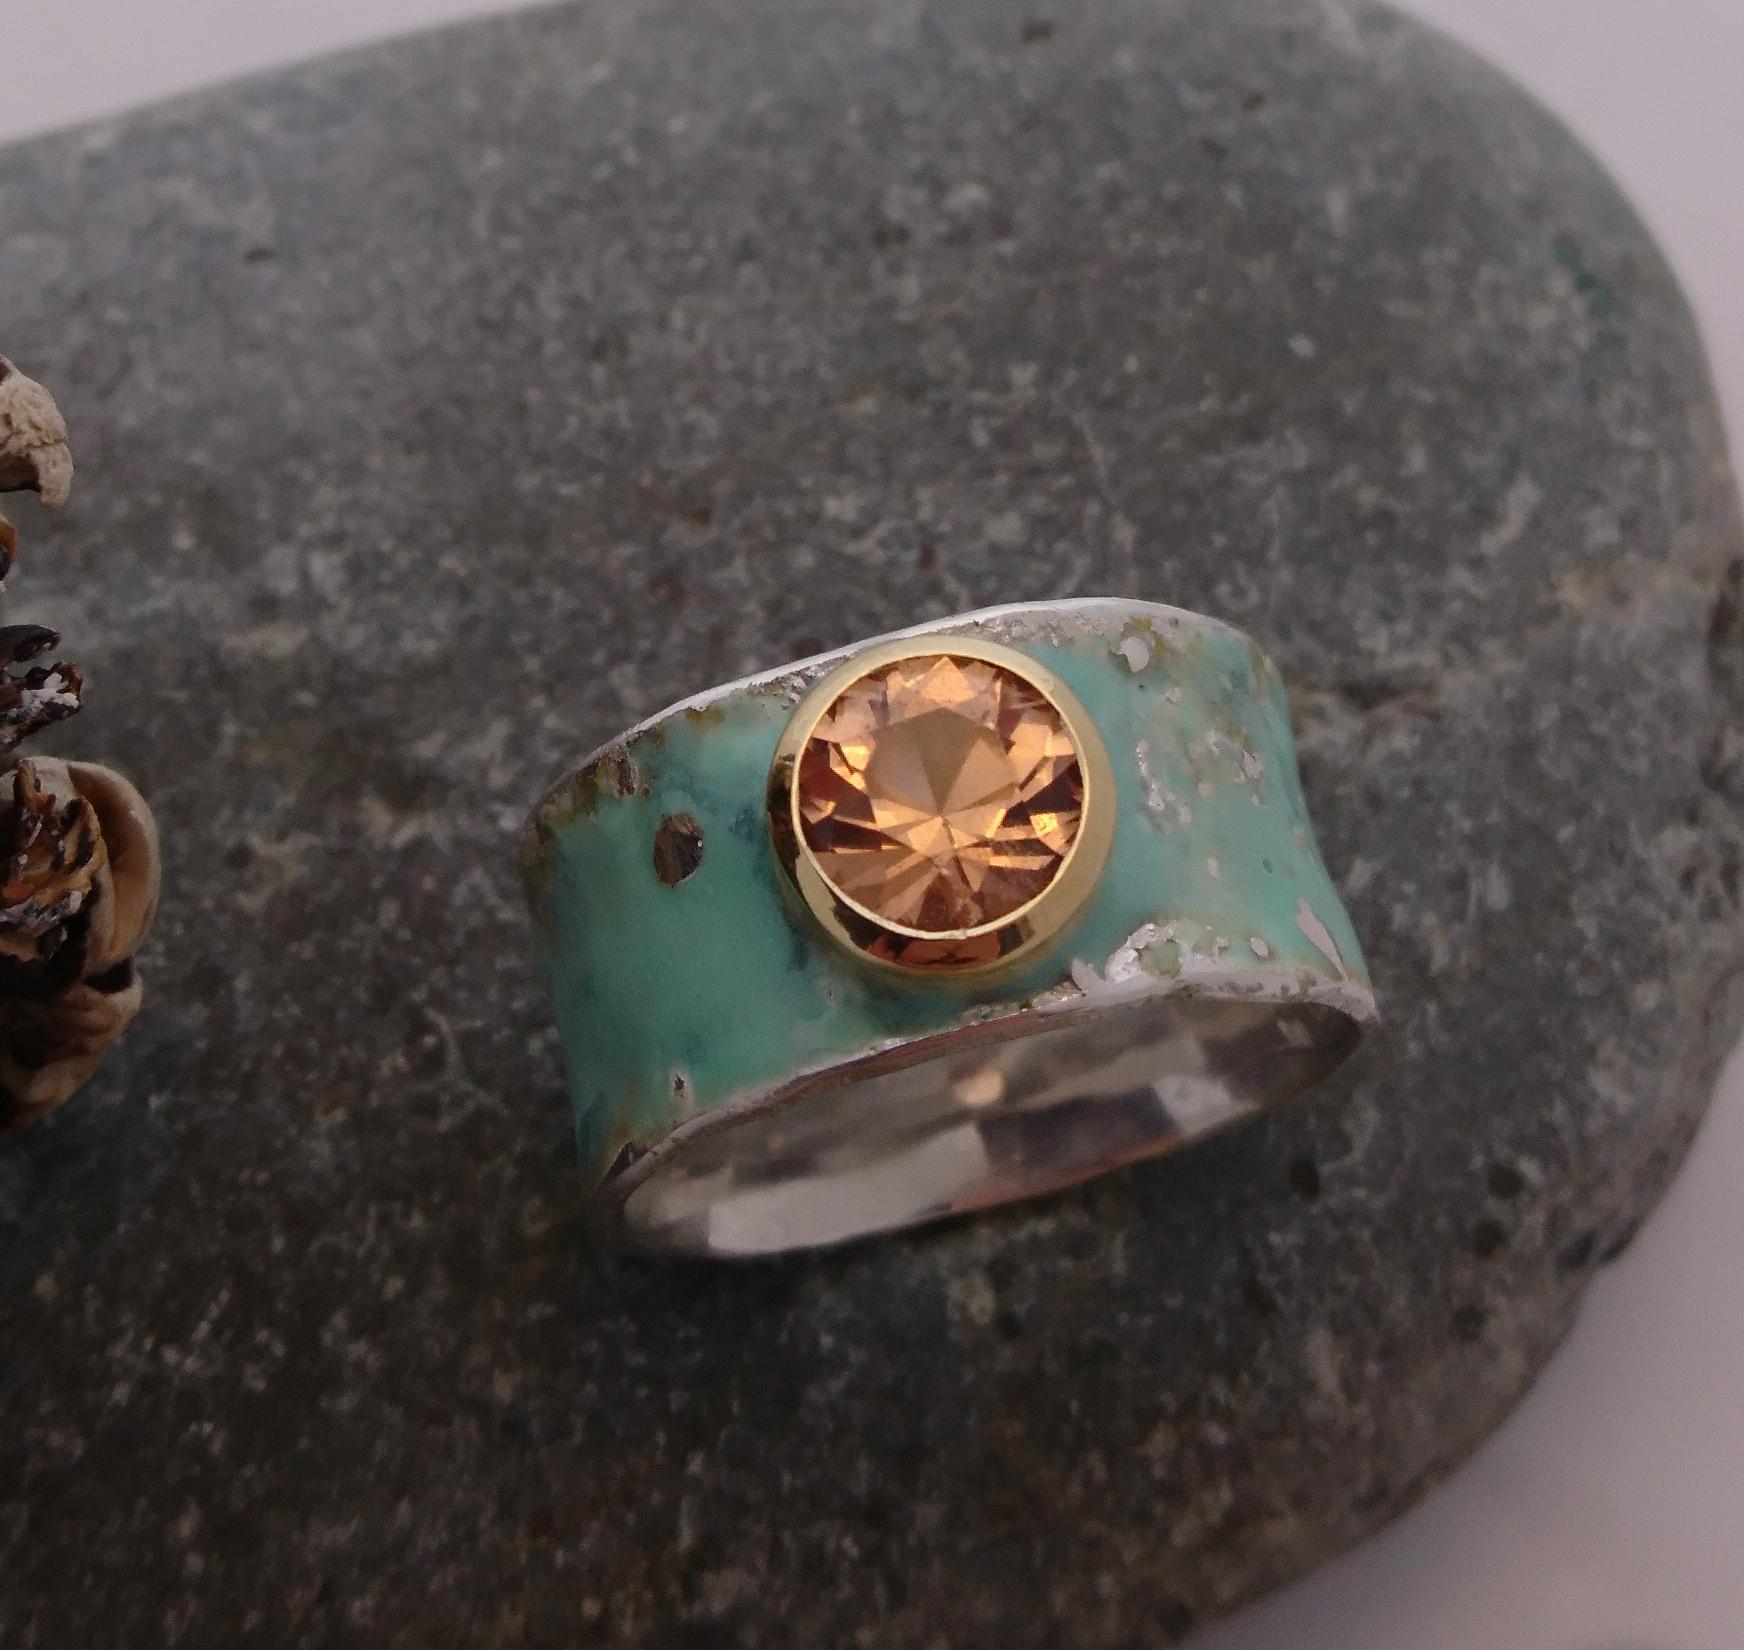 Ring, sterling silver, enamel, garnet (mined in Quebec, cut in Lunenburg) in 18k gold setting